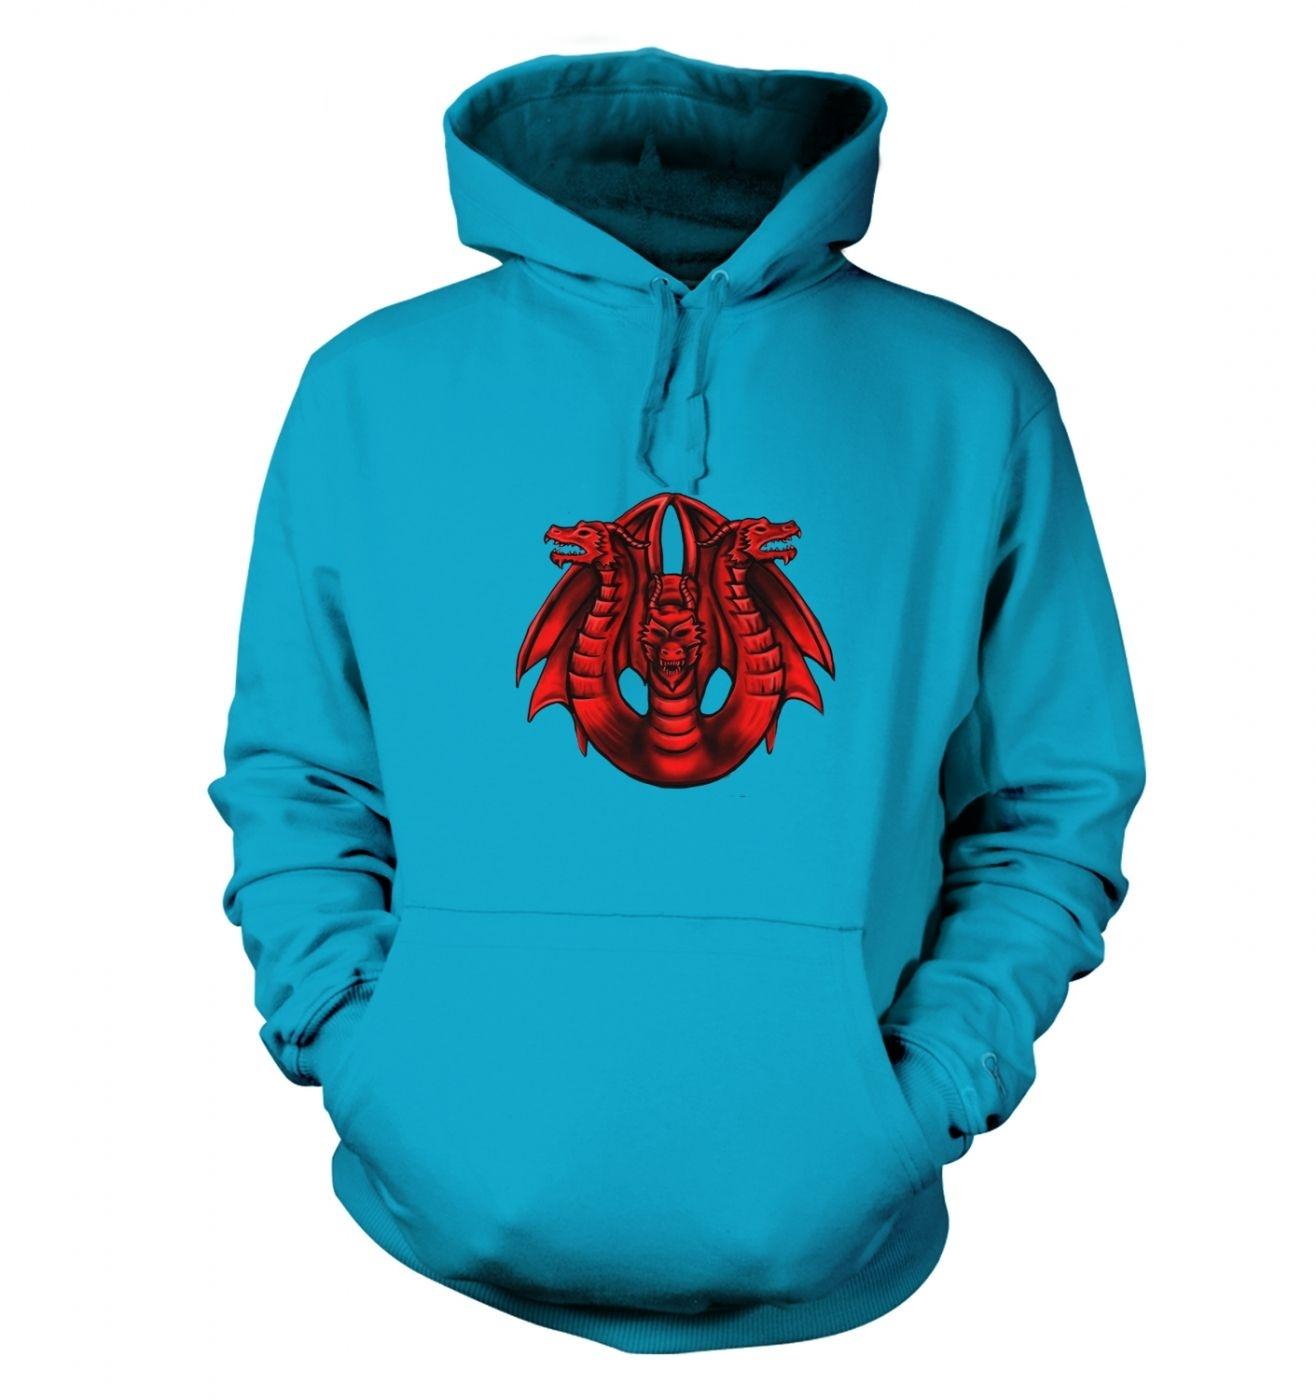 Three Headed Dragon hoodie